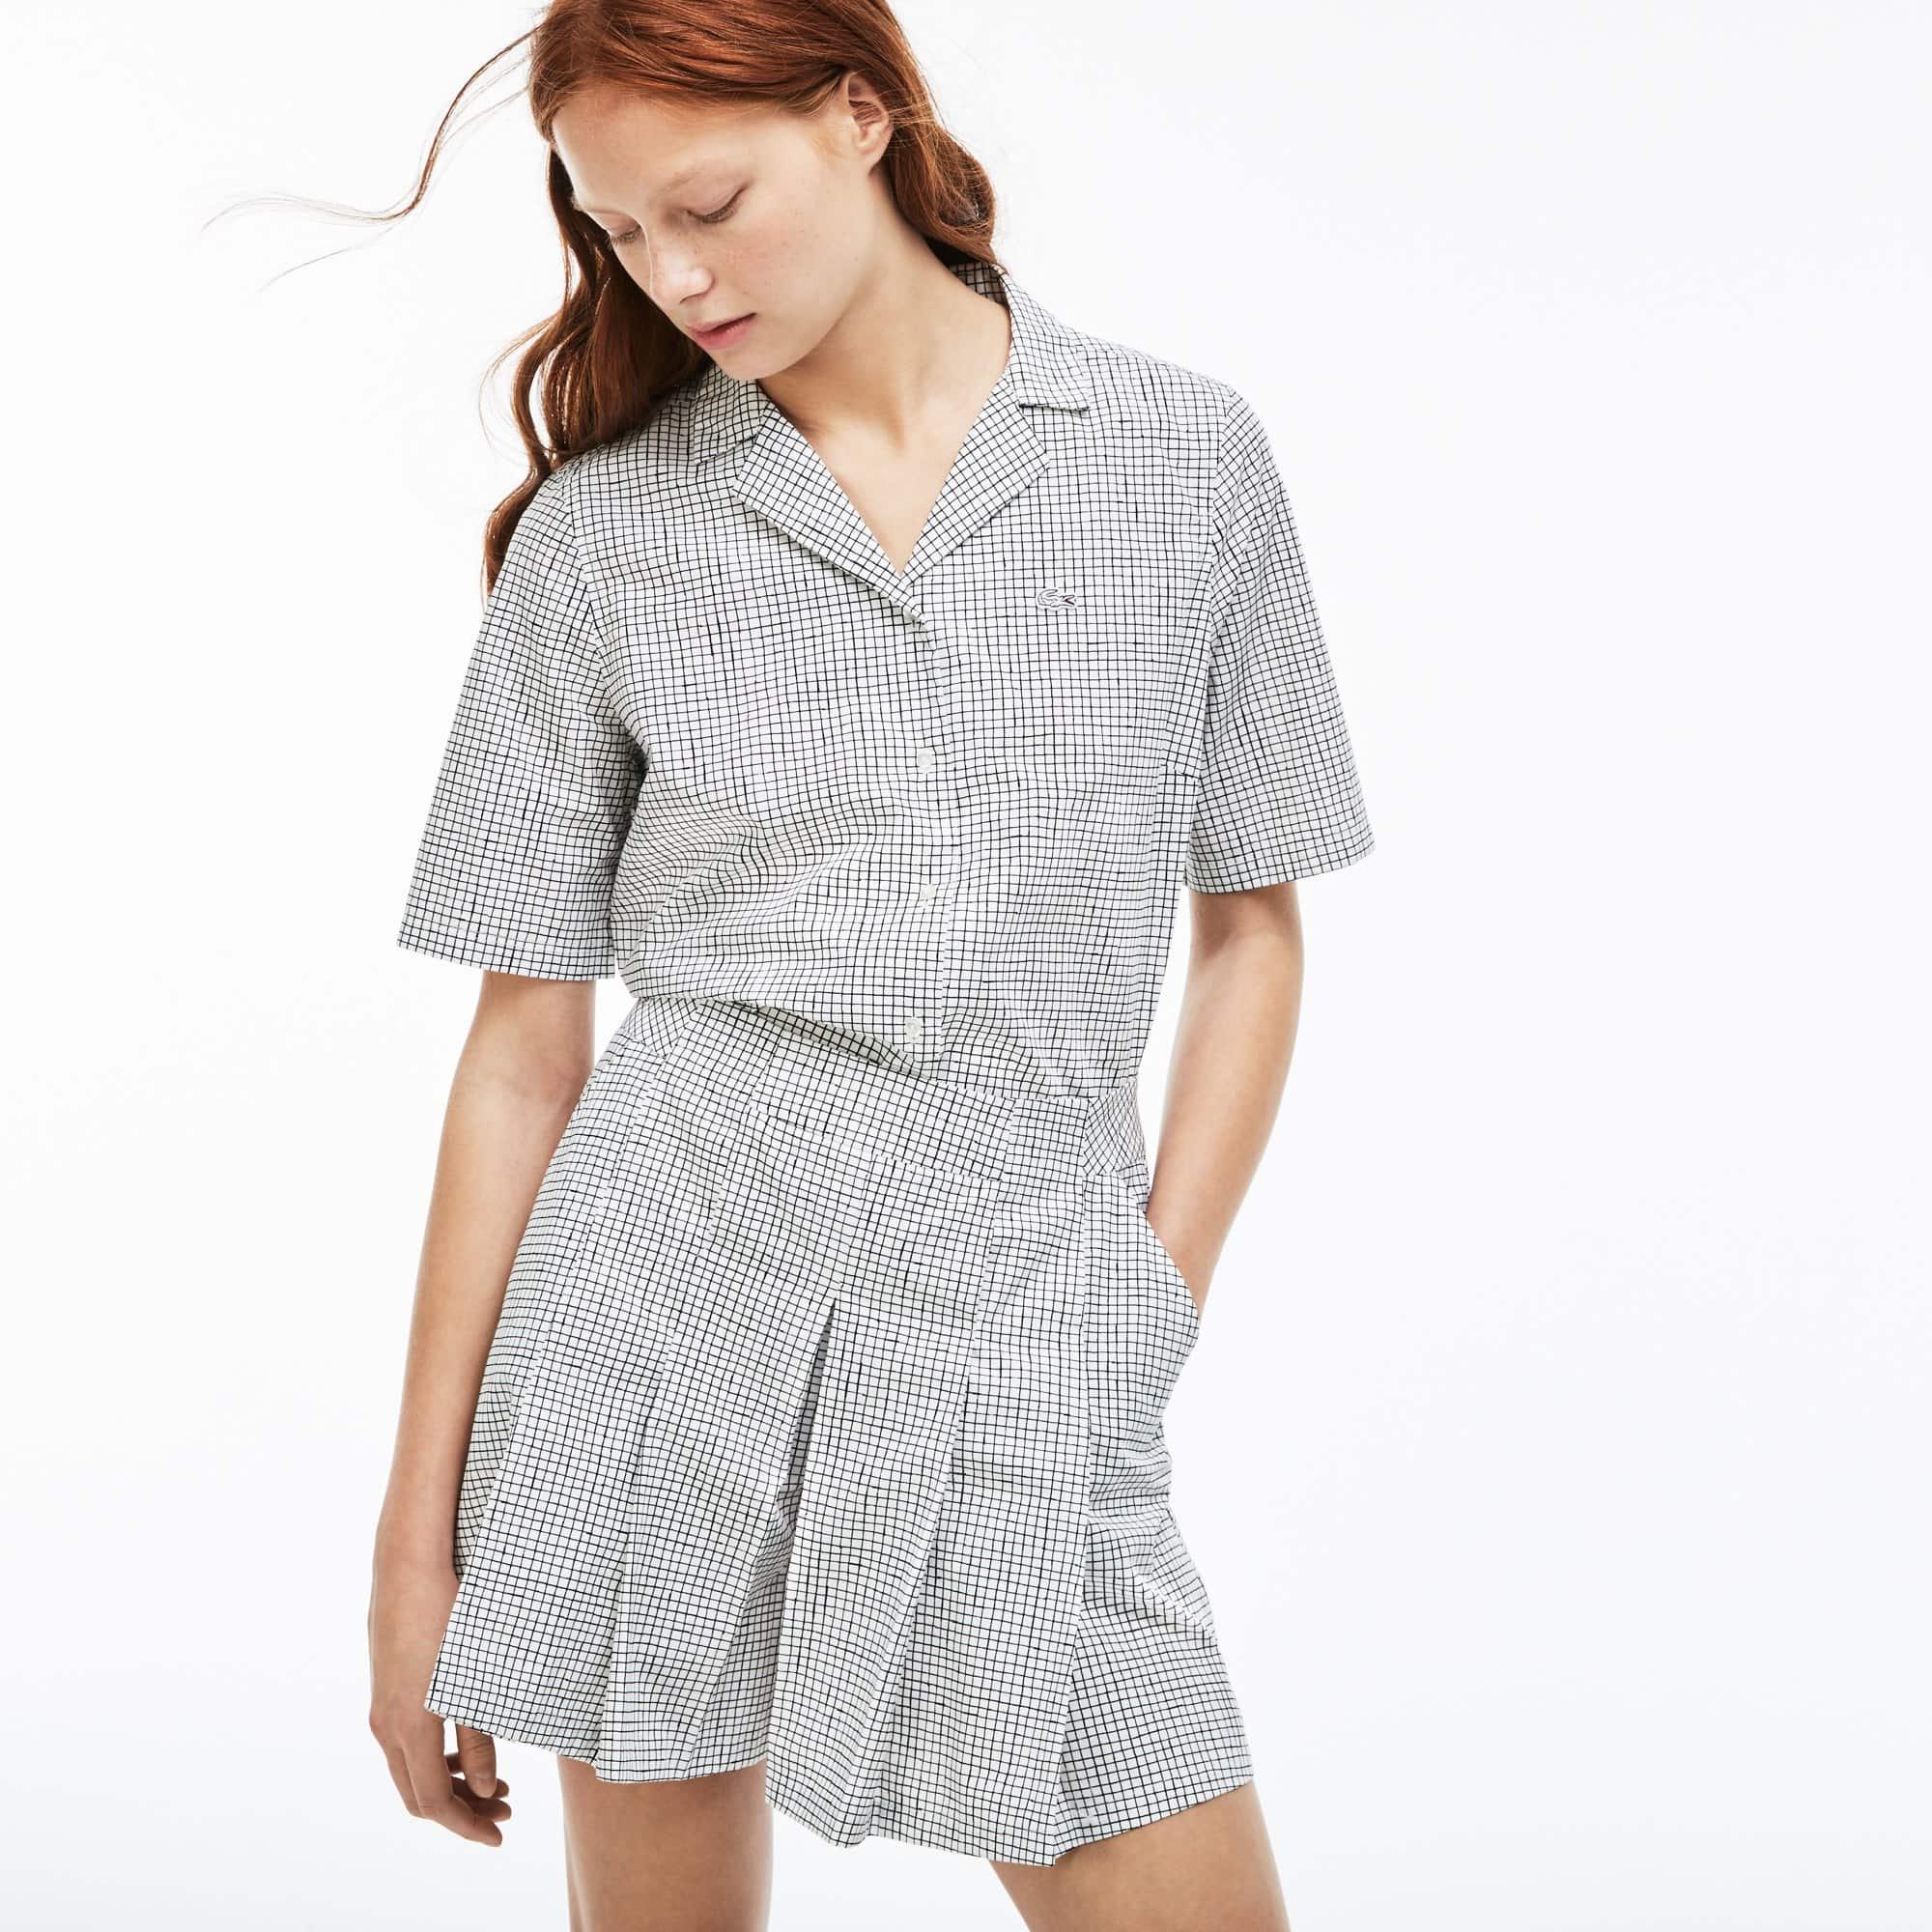 Women's Lacoste LIVE Small Check Cotton Poplin Pleated Shorts